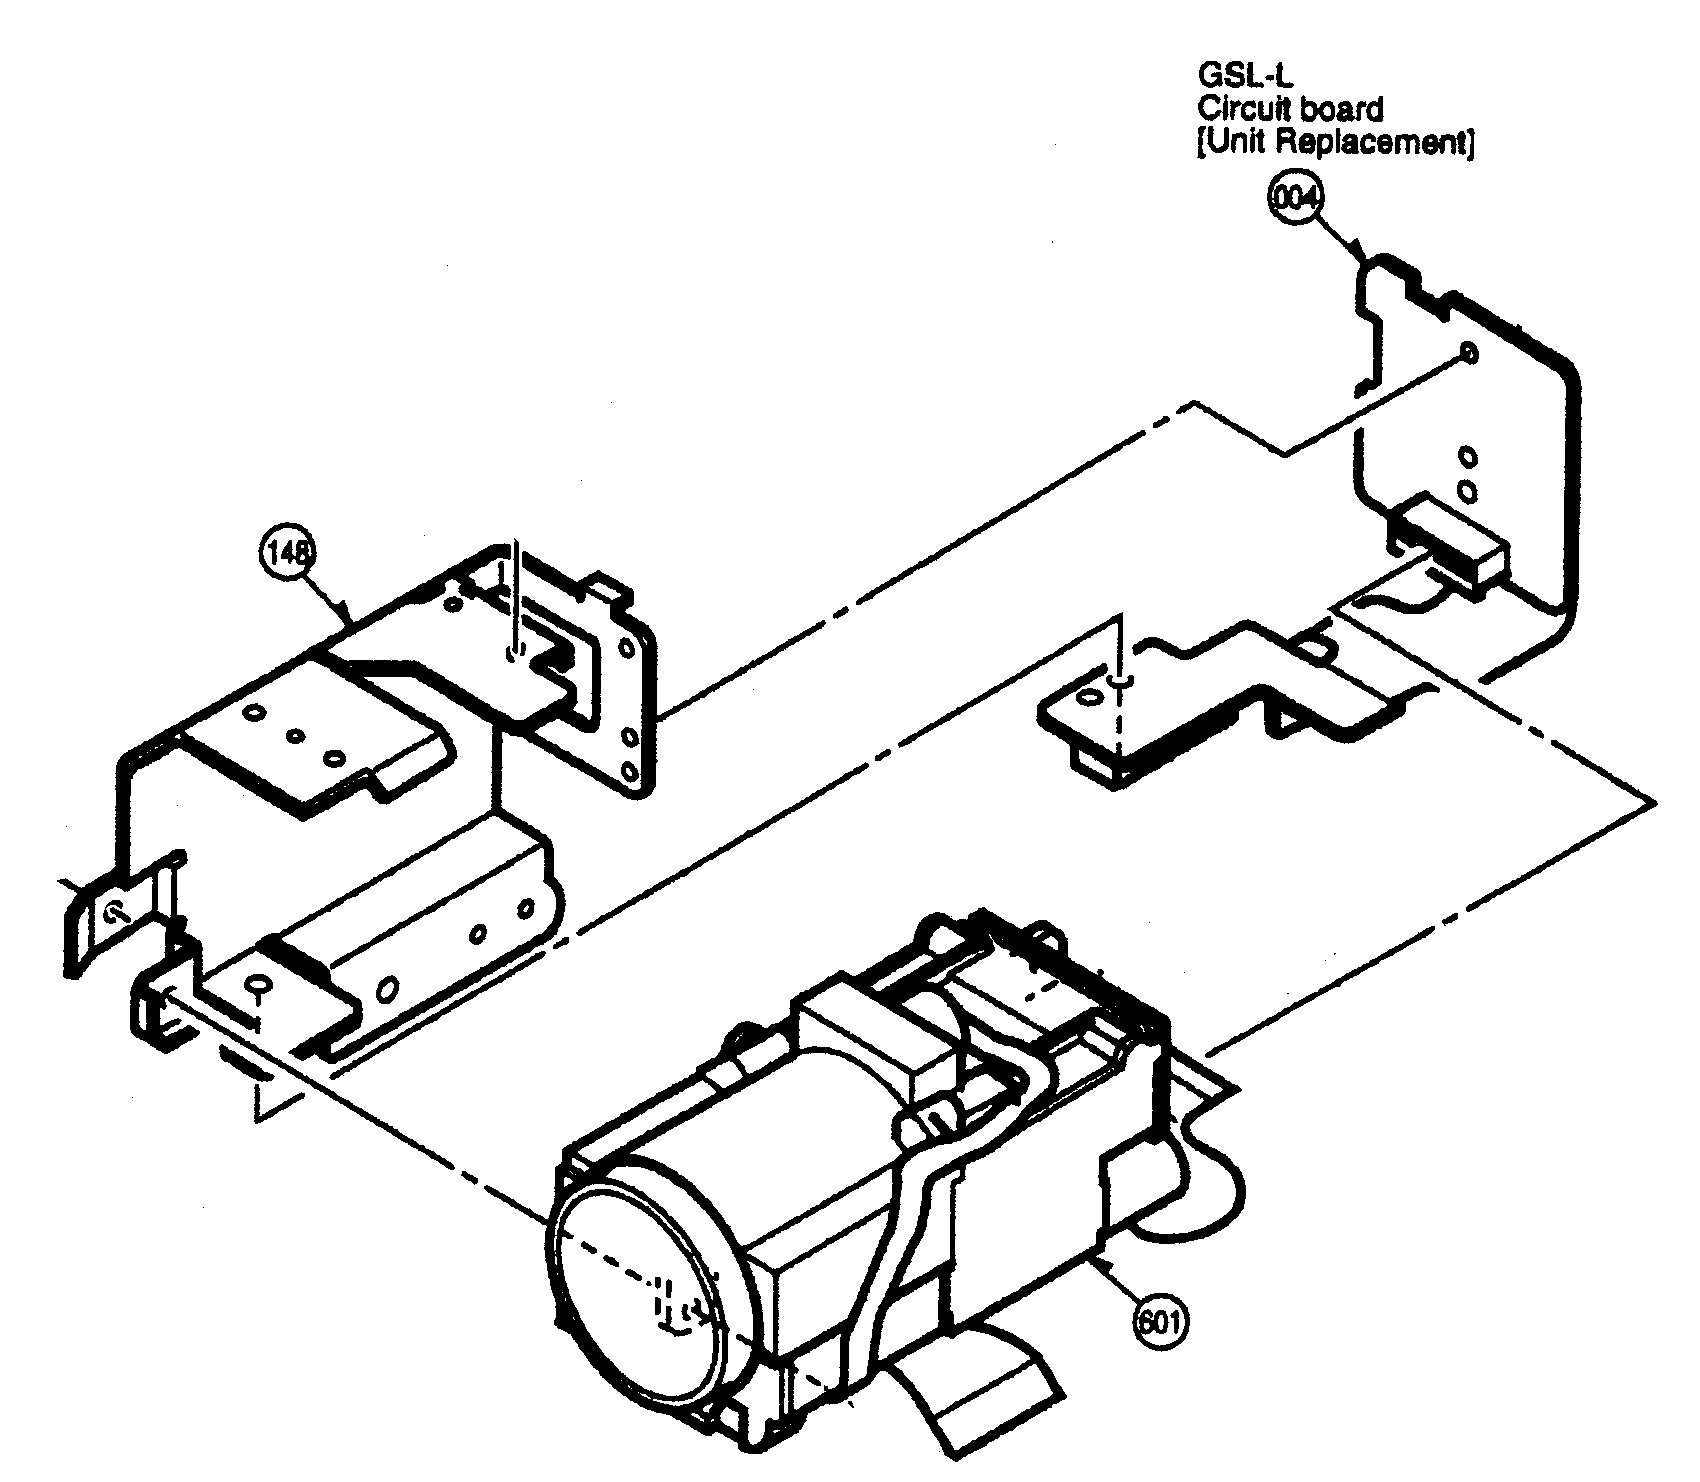 Panasonic model VDR-M53PP digital camcorder genuine parts